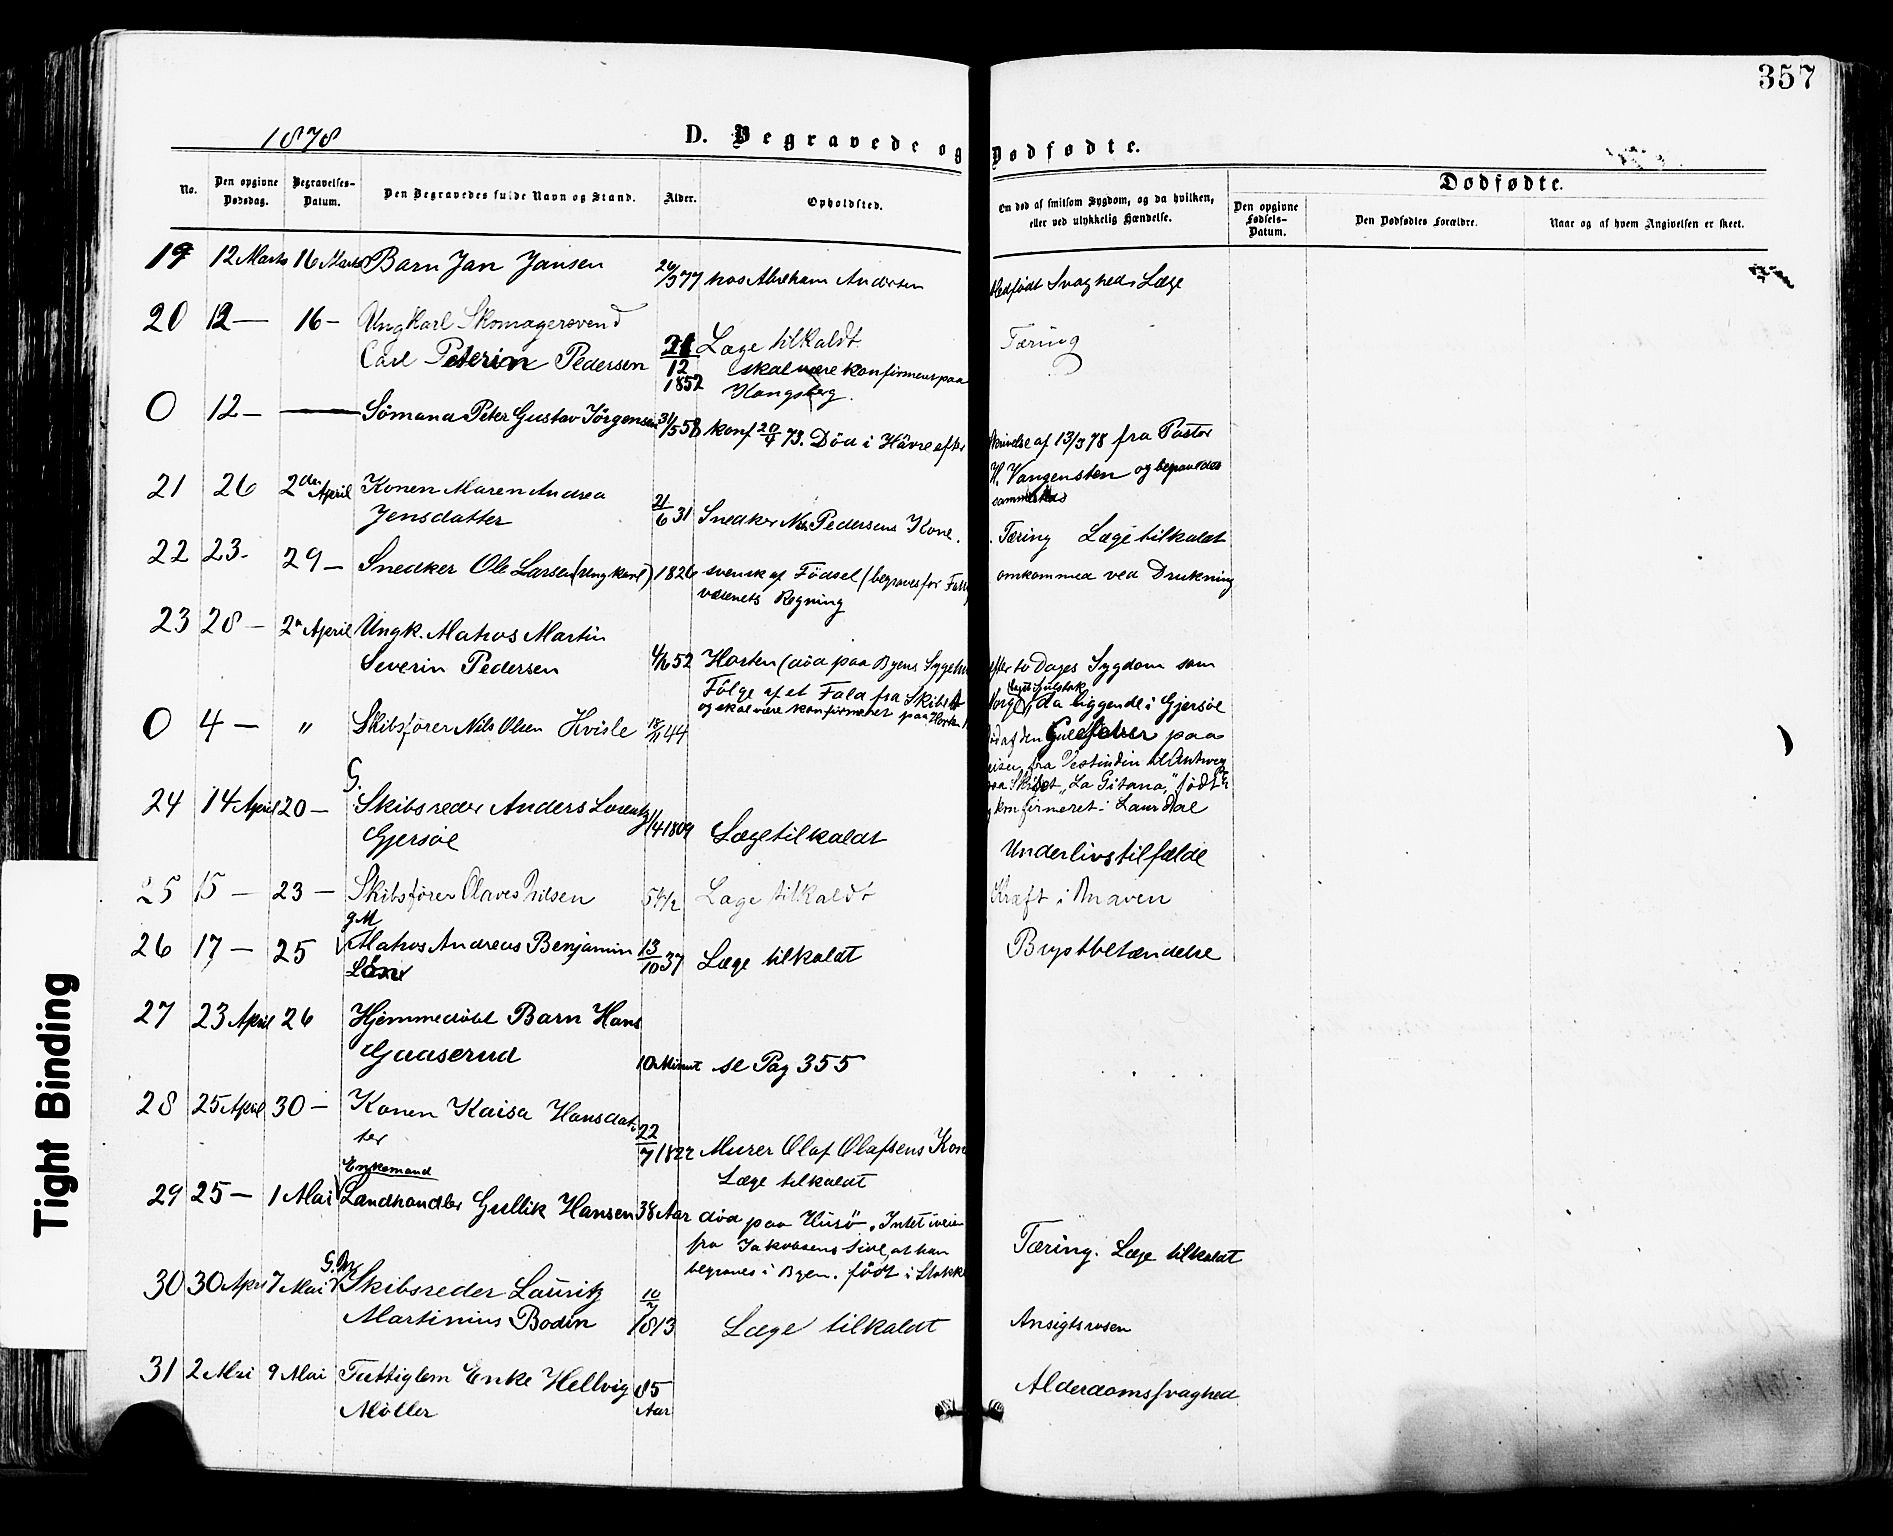 SAKO, Tønsberg kirkebøker, F/Fa/L0010: Ministerialbok nr. I 10, 1874-1880, s. 357